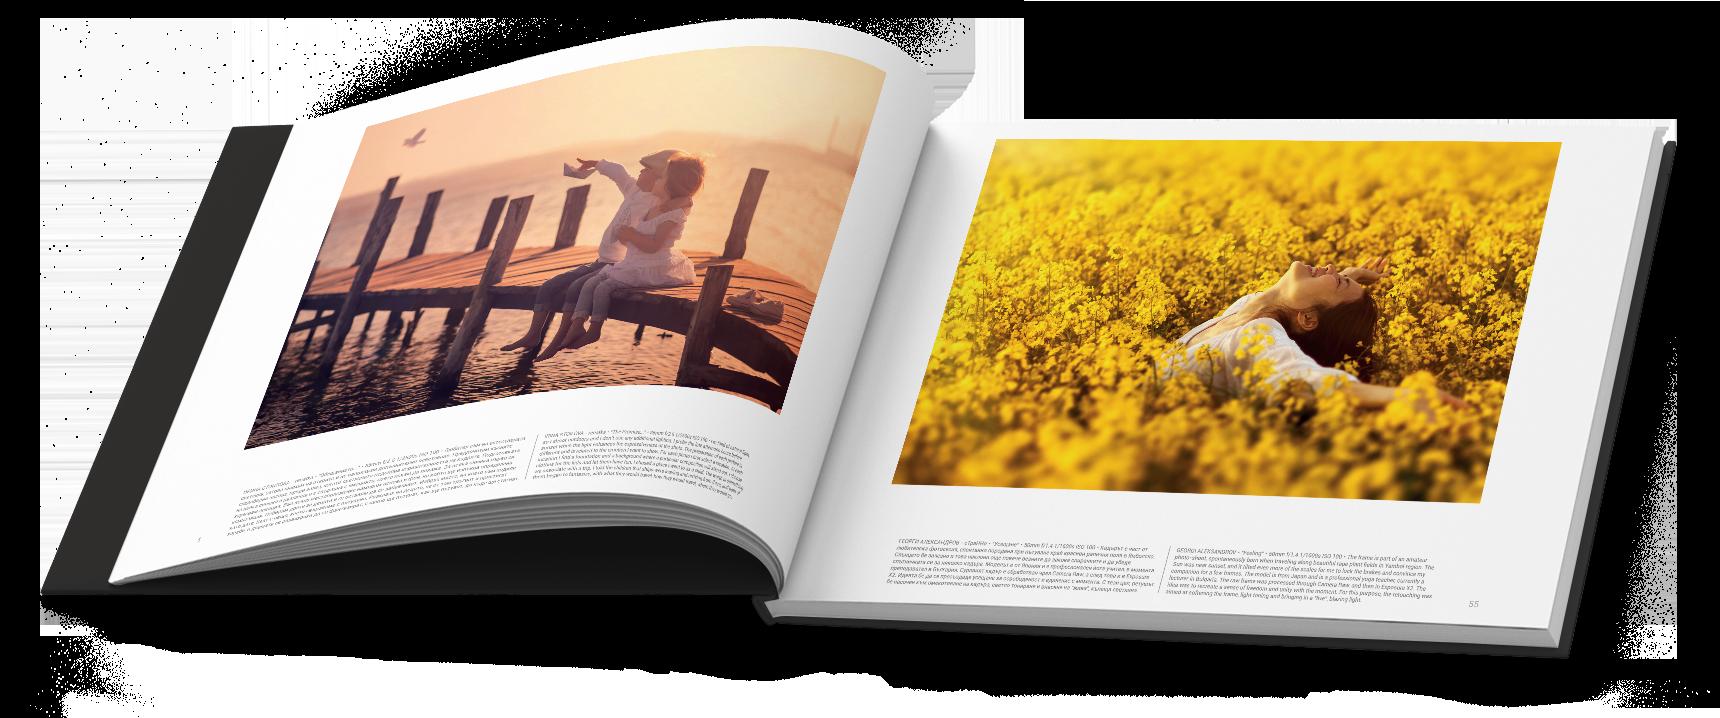 Фотографски Албум 2018 г. - Black&White &Color - страници 54-55